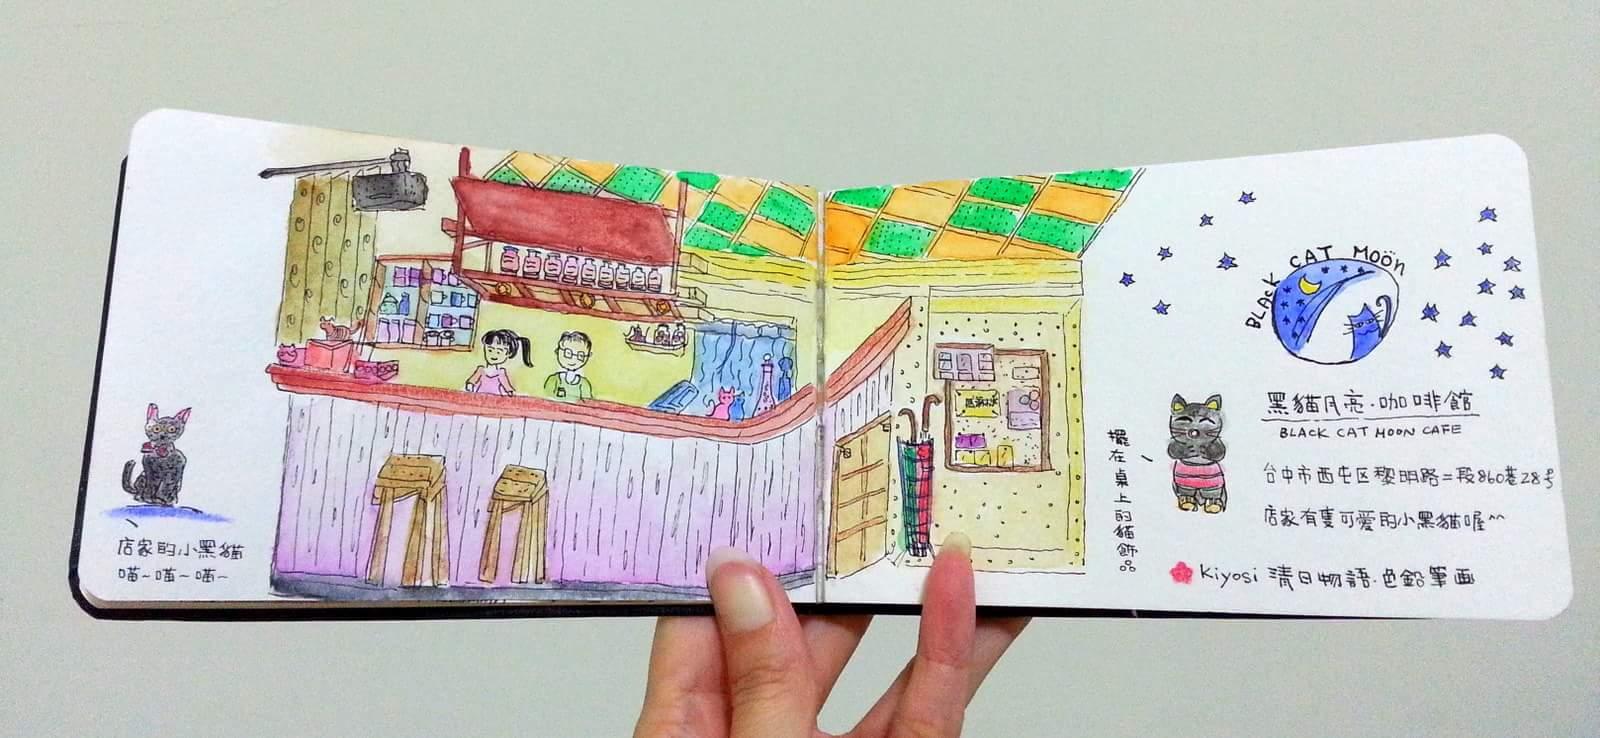 Café Sketch~ Black Cat &Moon Café,Taichung, Taiwan